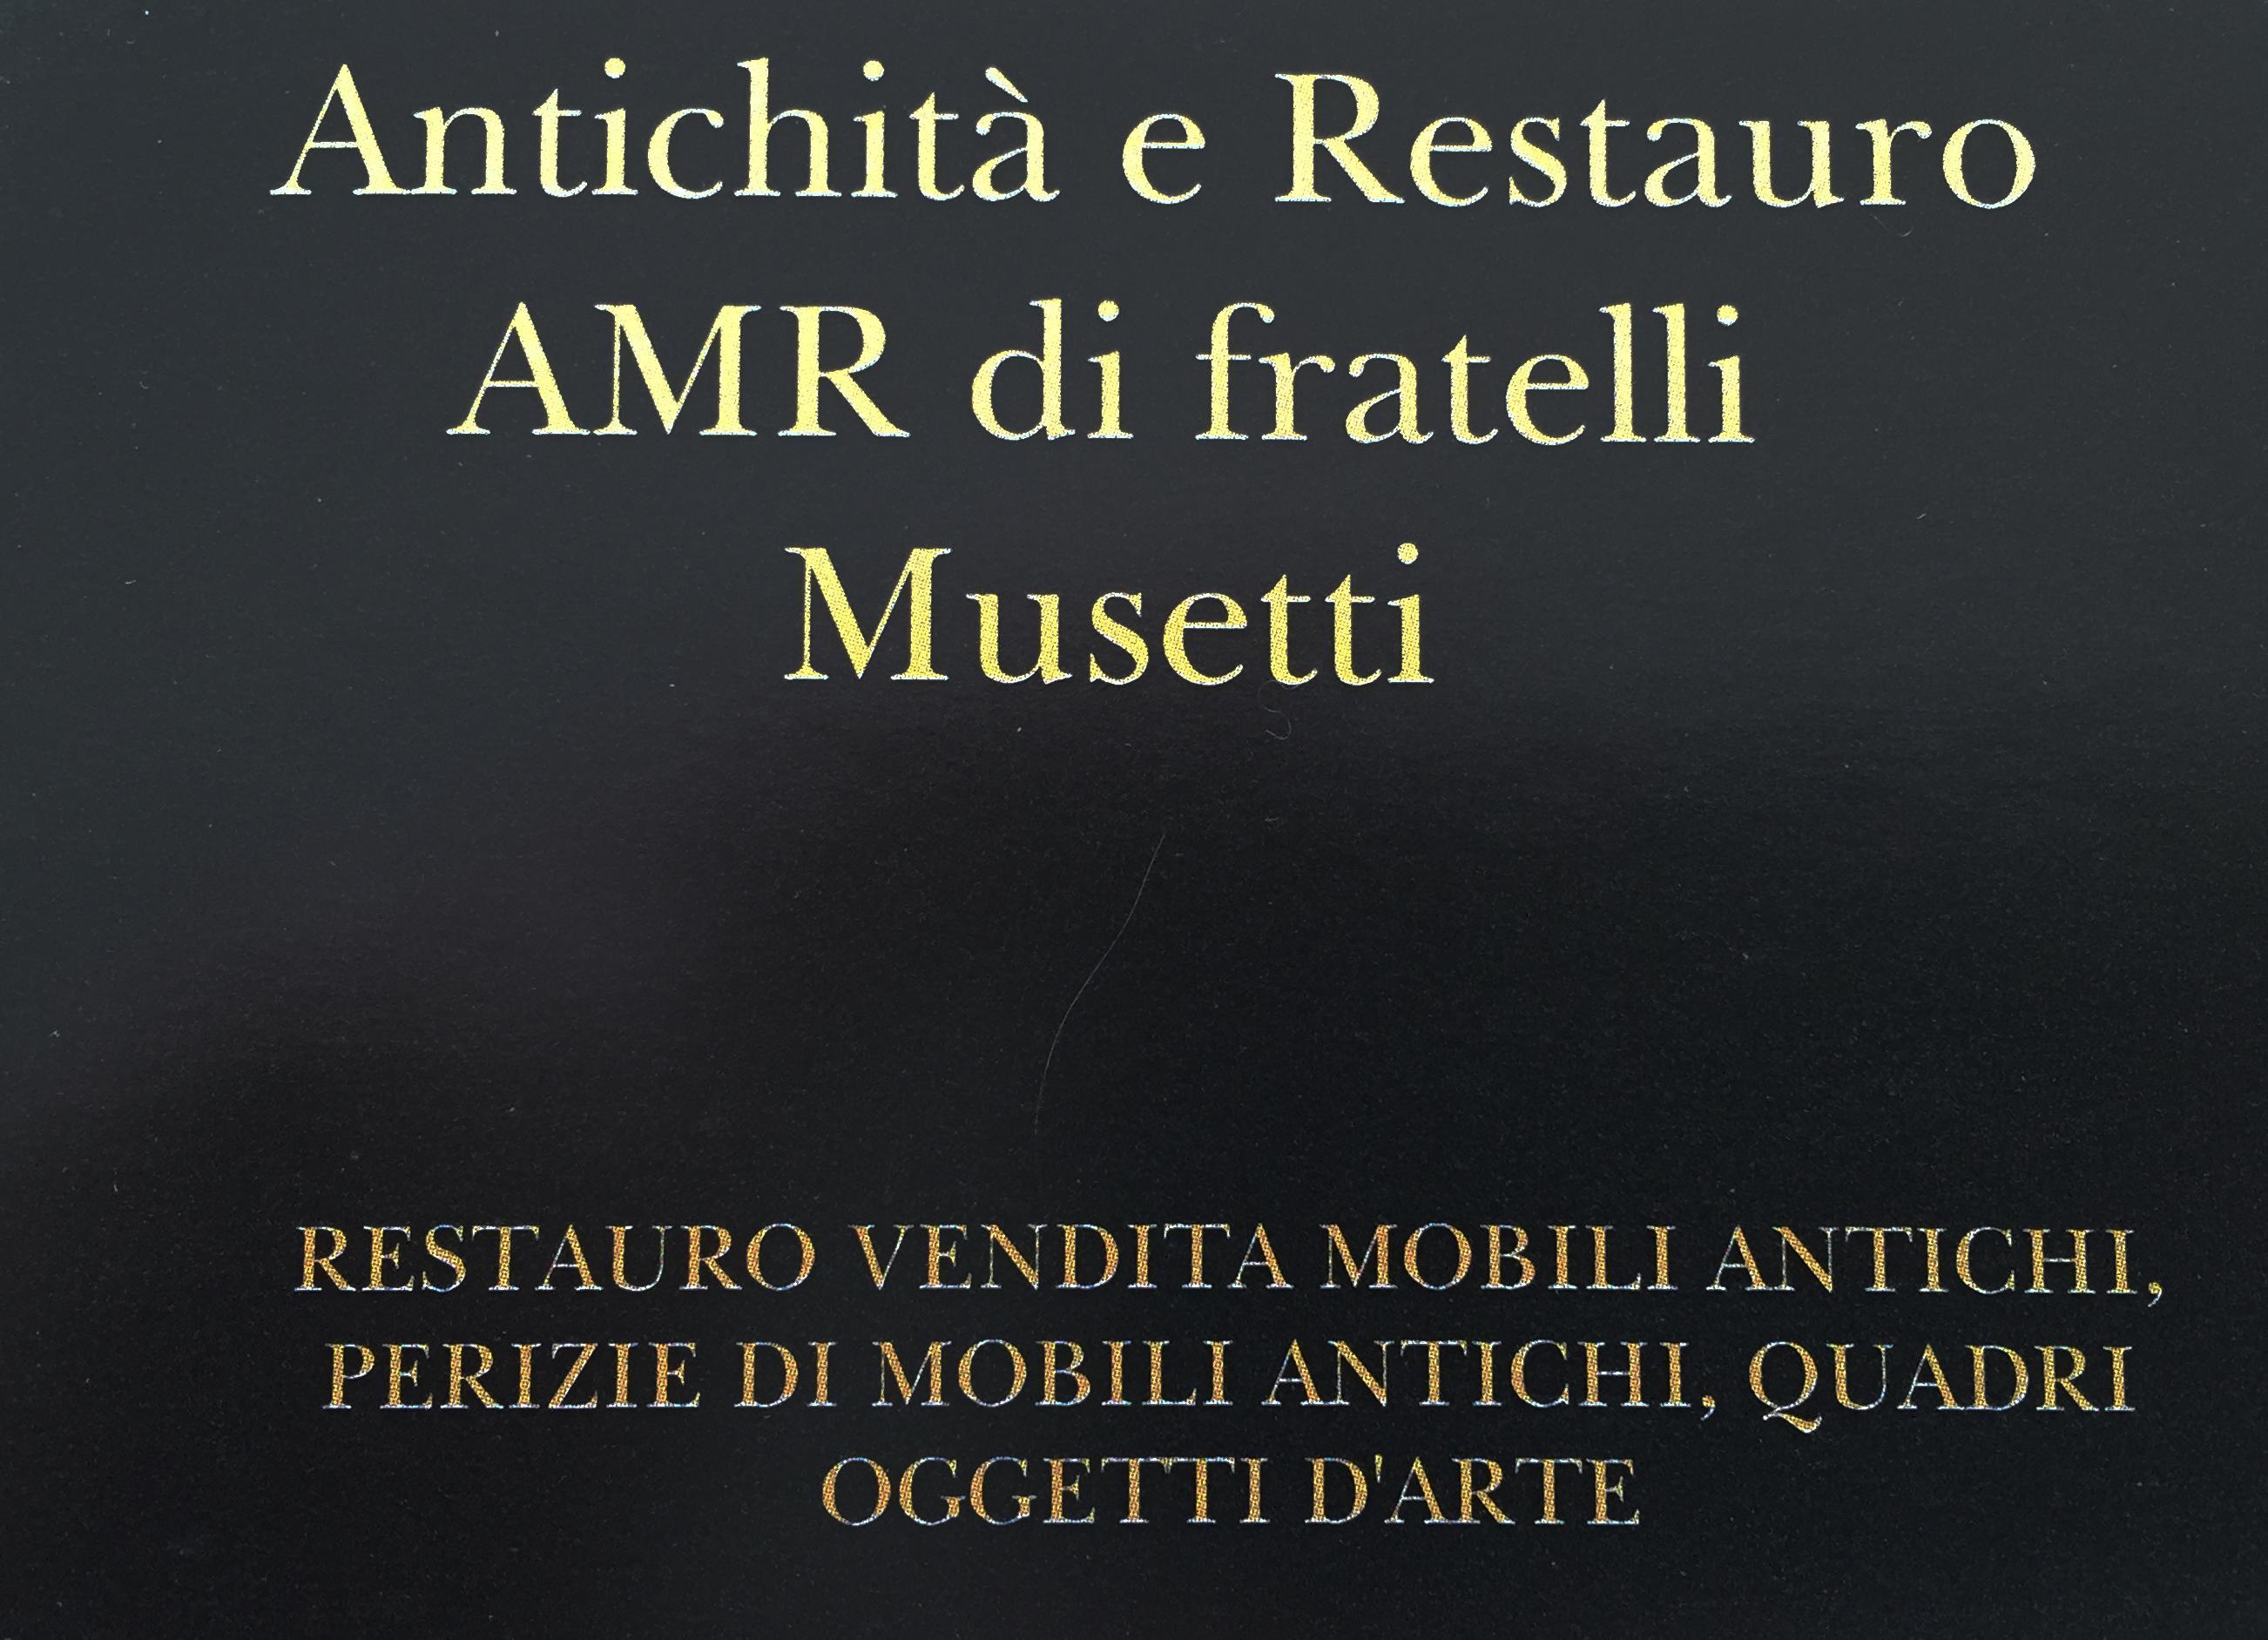 http://www.musettimobiliantichi.it/wp-content/uploads/2015/03/mobili-antichi.jpg